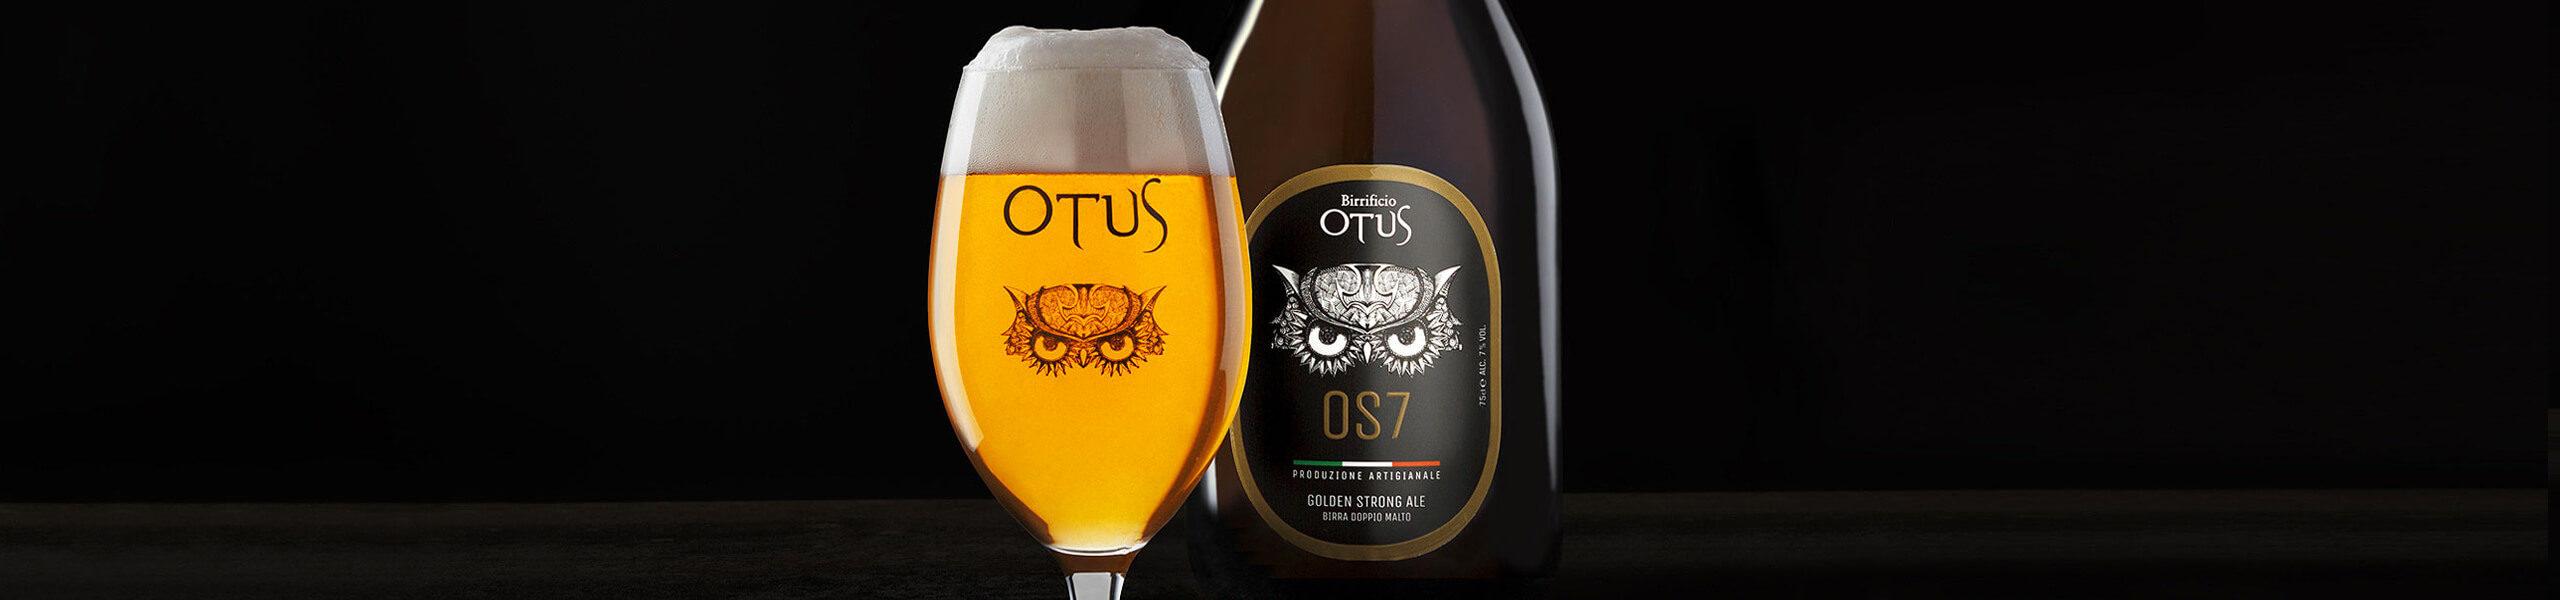 Slide Otus Os7